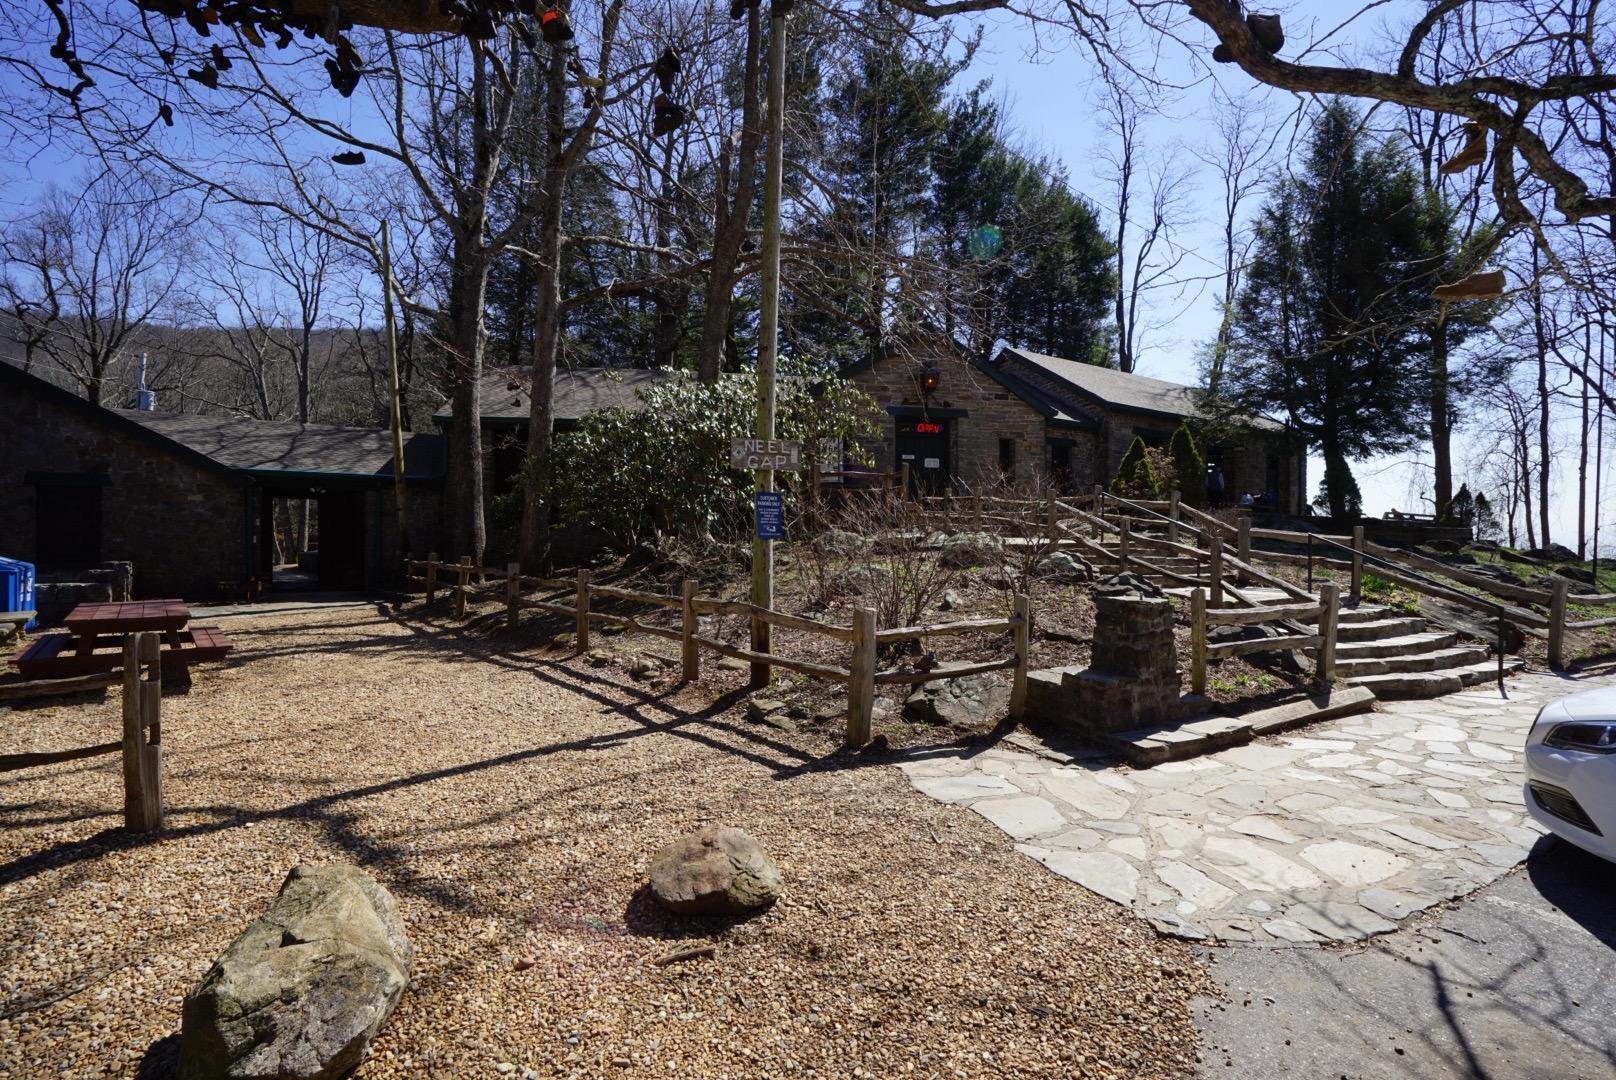 Appalachian Trail Thru Hike Amicalola Falls State Park